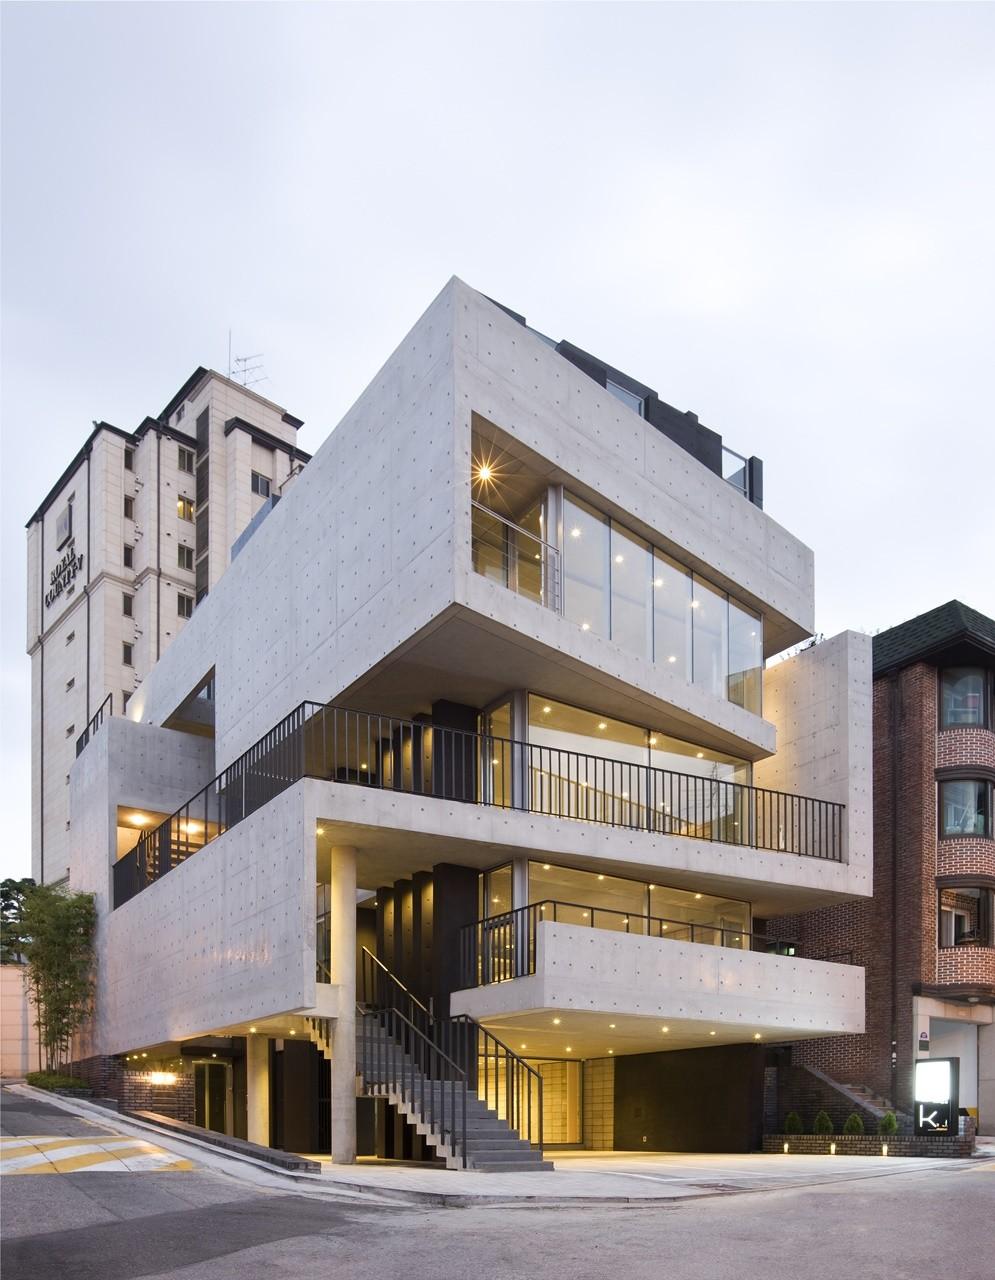 Bati_rieul / L'EAU design   ArchDaily